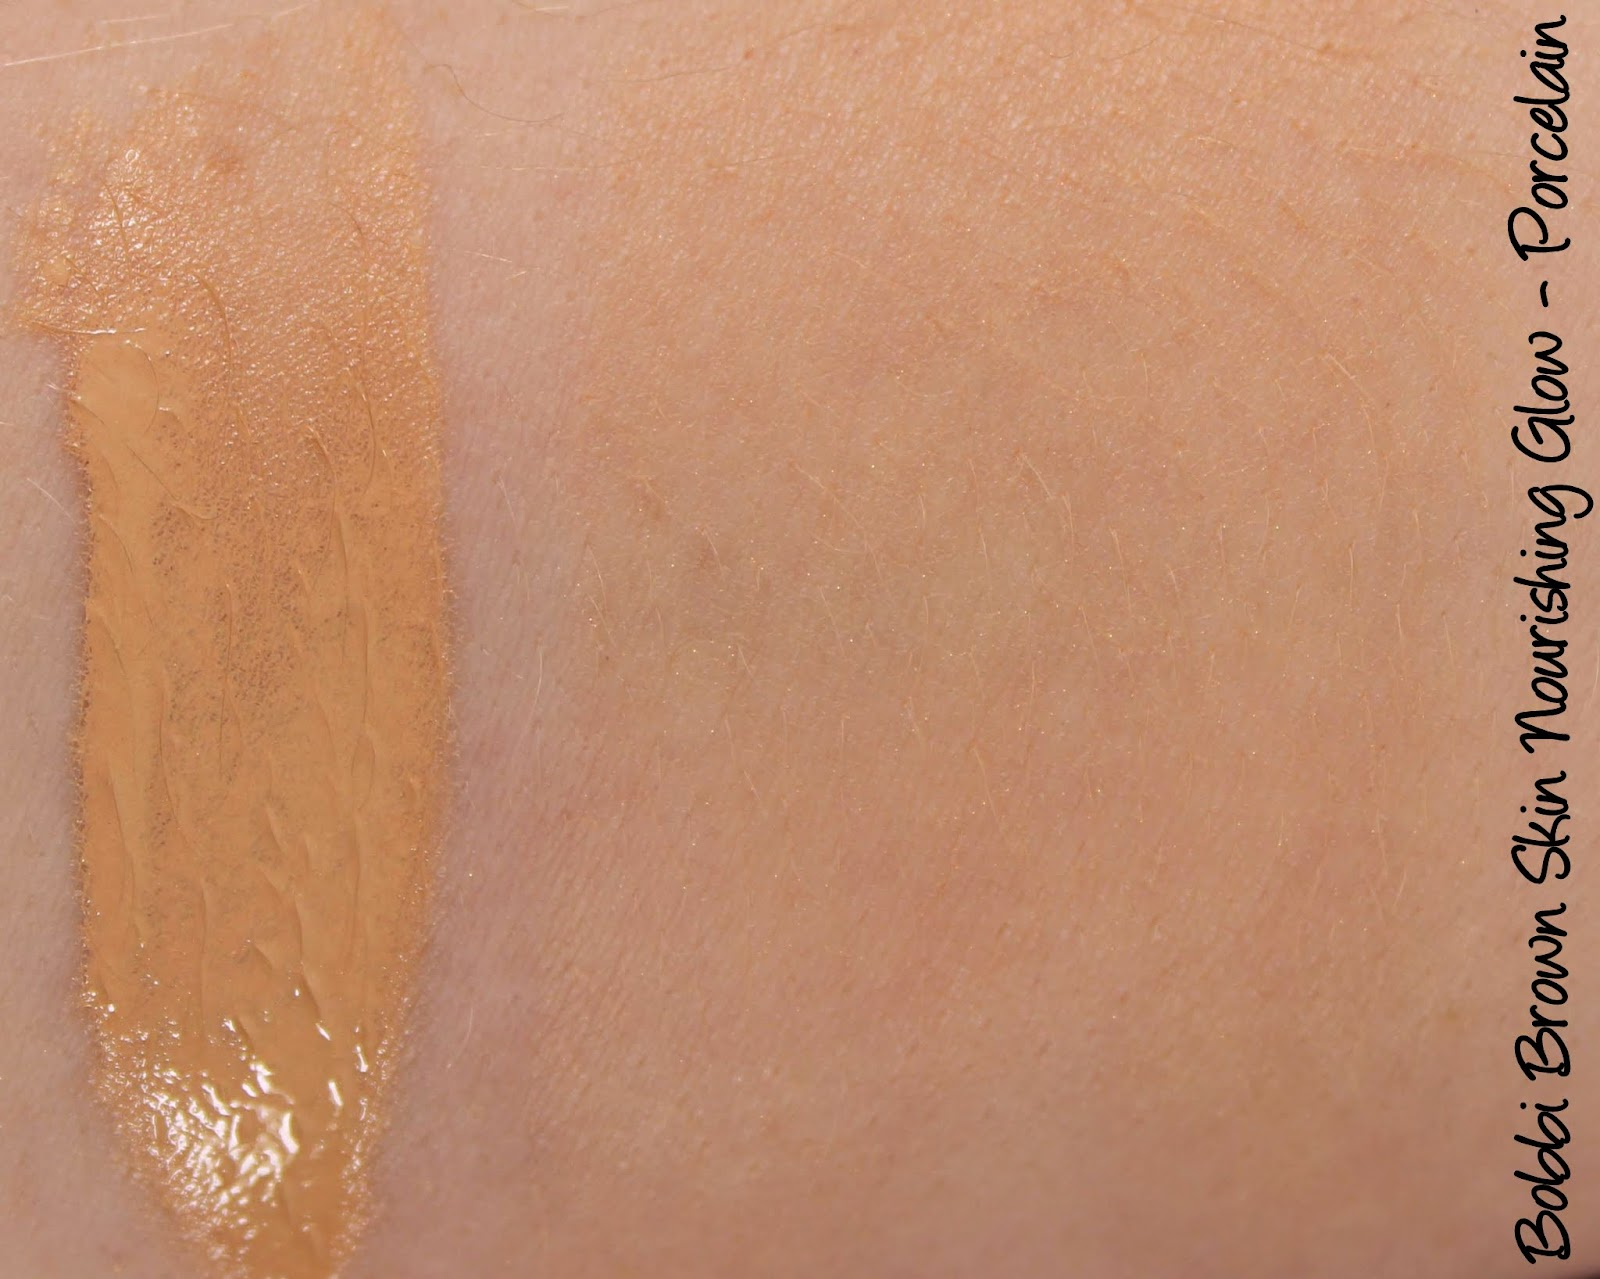 Bobbi Brown Skin Nourishing Glow Porcelain Swatches Review